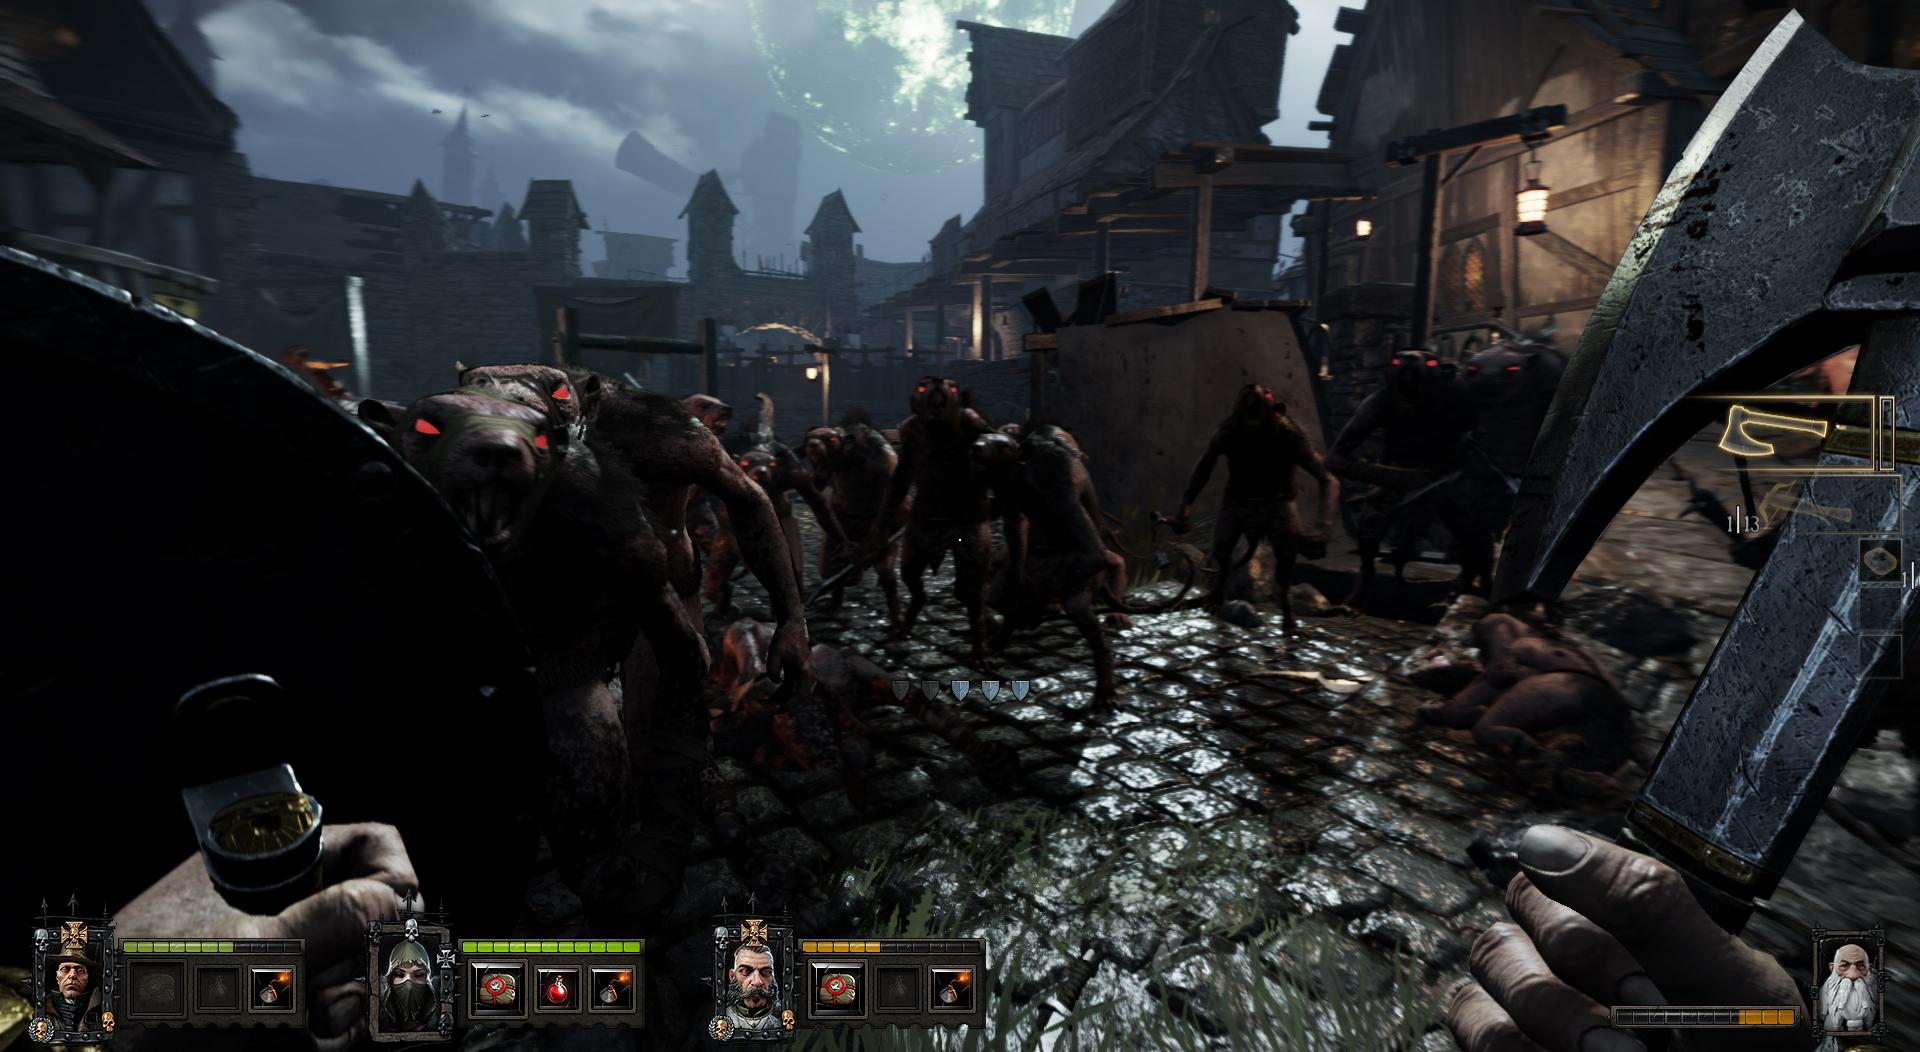 Warhammer End Of Times : Vermintides Ss_f1ca720e3fba5108cdf5611da3795ac52c325106.1920x1080